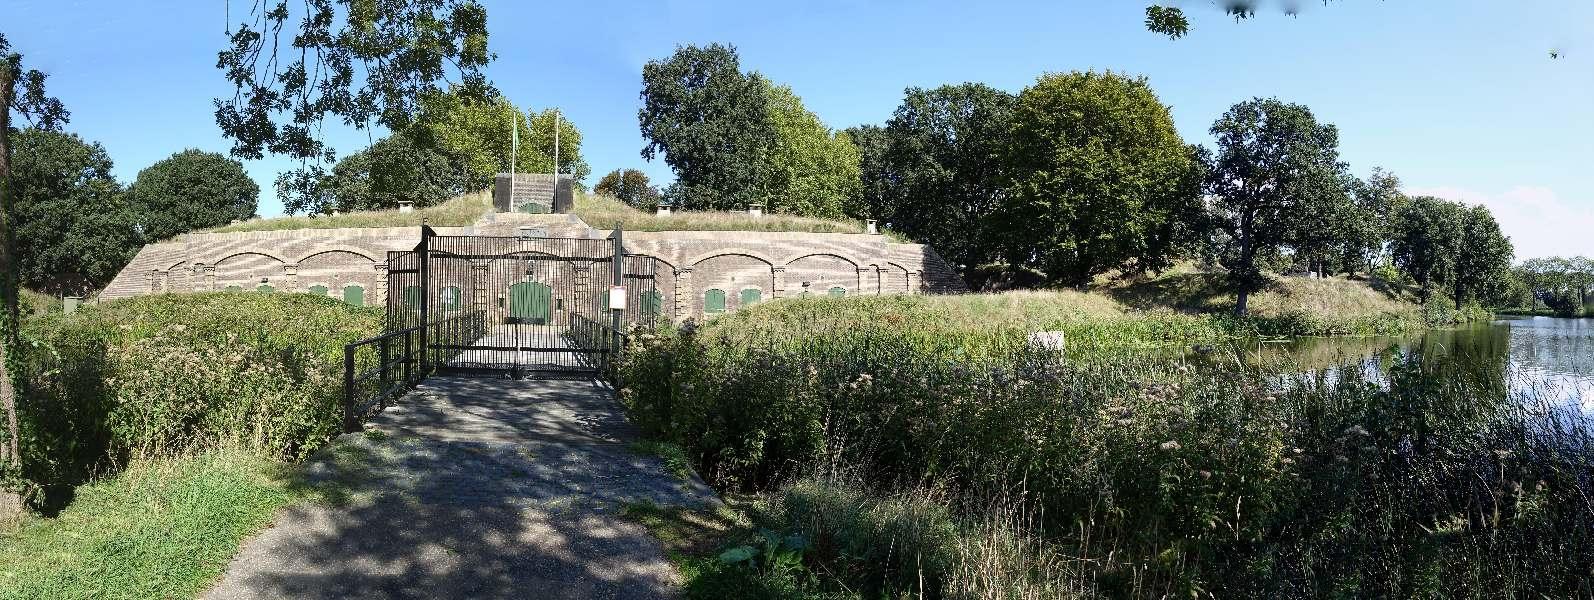 180917-06-Utrecht, Fort Gagel